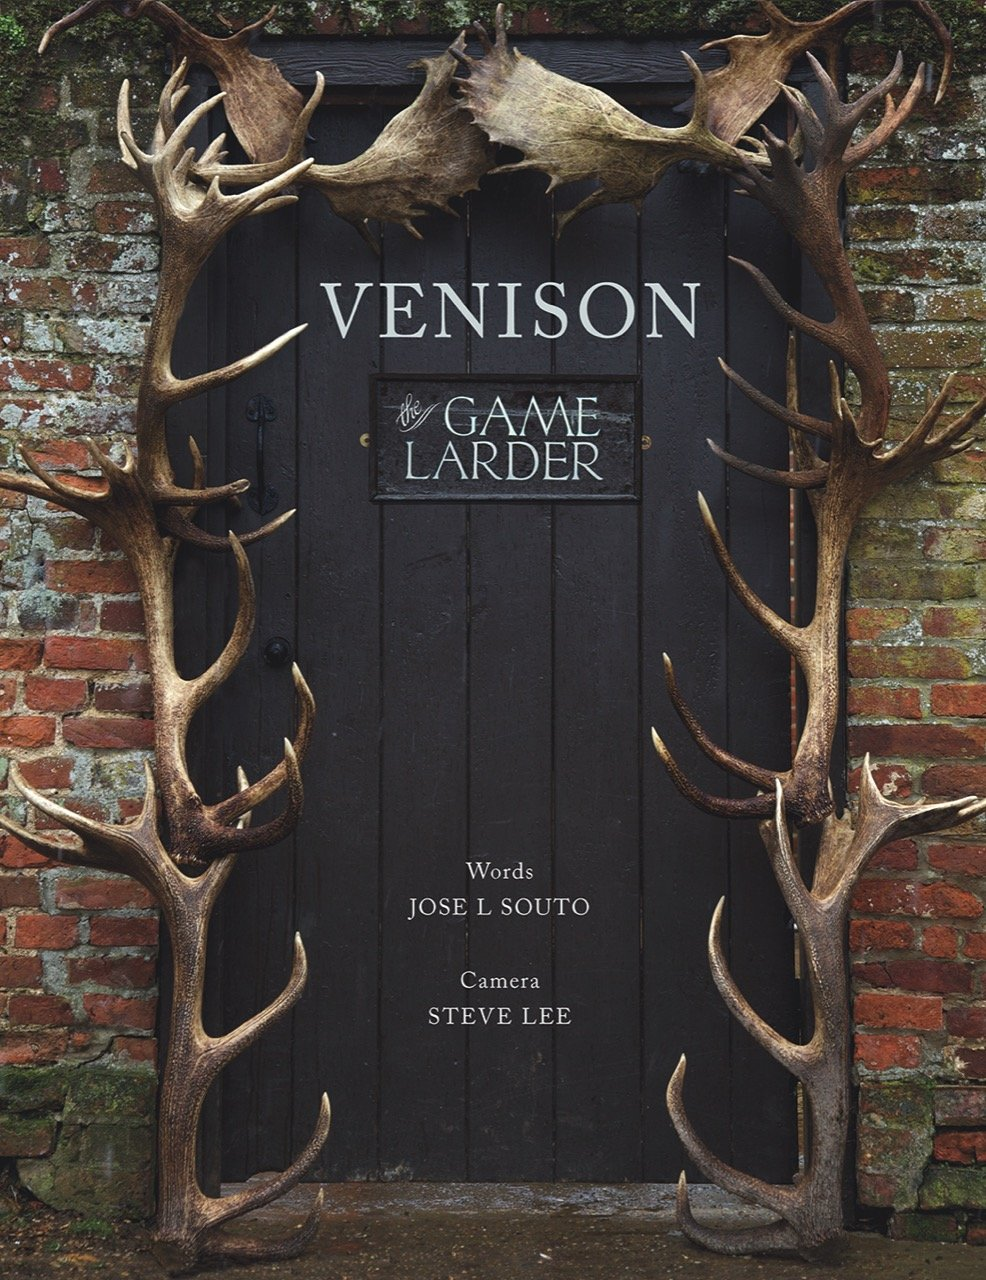 Venison: The Game Larder